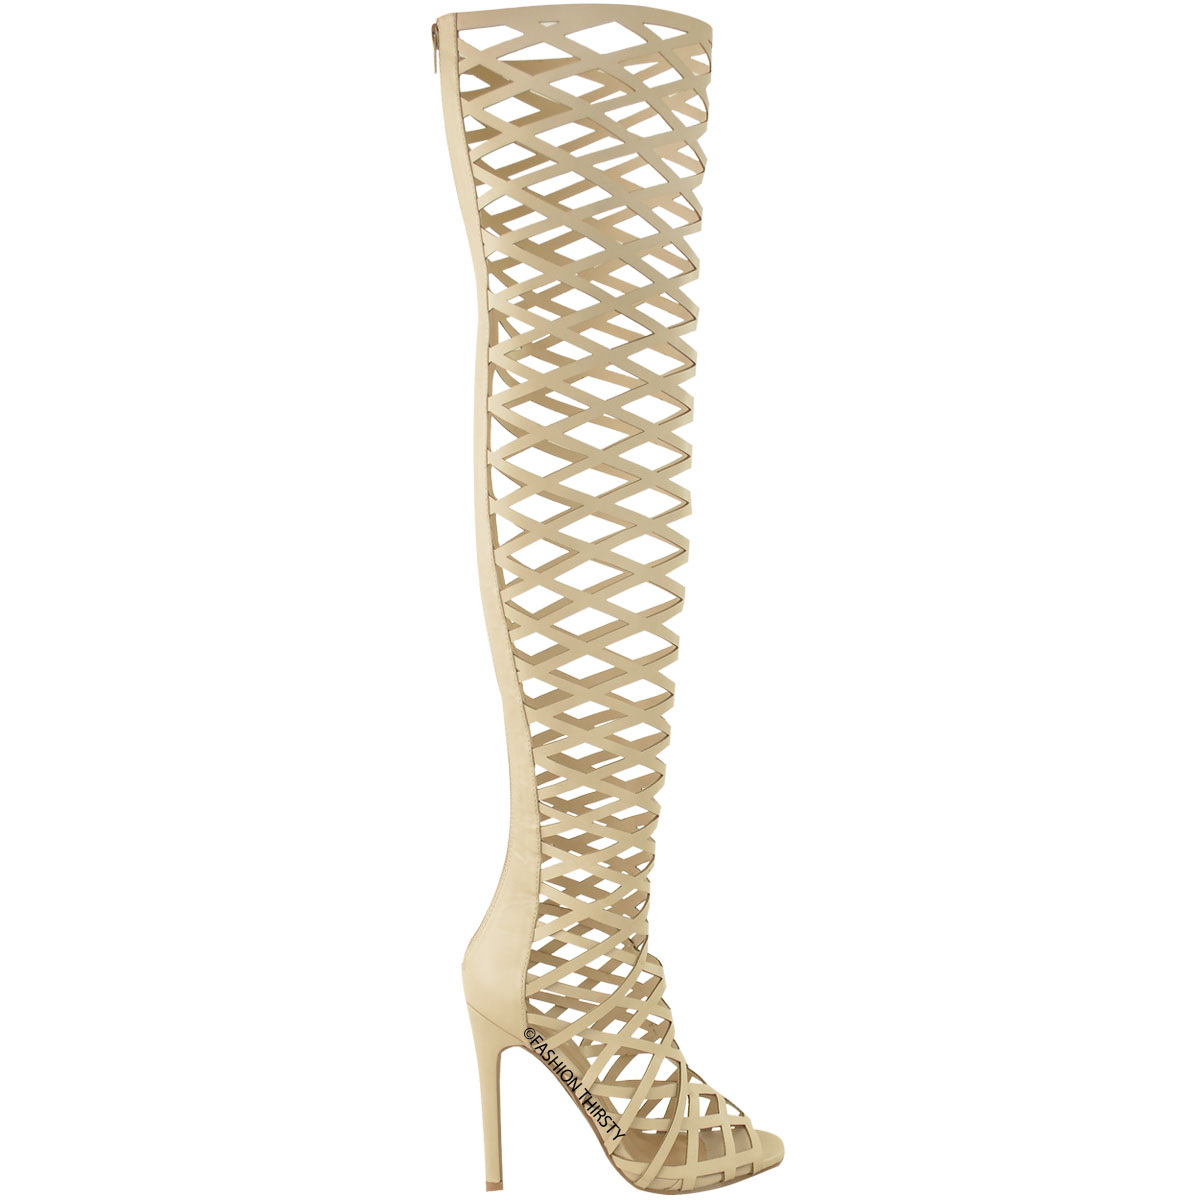 LADIES damen CUT OUT OVER THE KNEE THIGH HIGH HIGH HIGH STILETTO HEELS Stiefel SANDALS Größe 975b3a